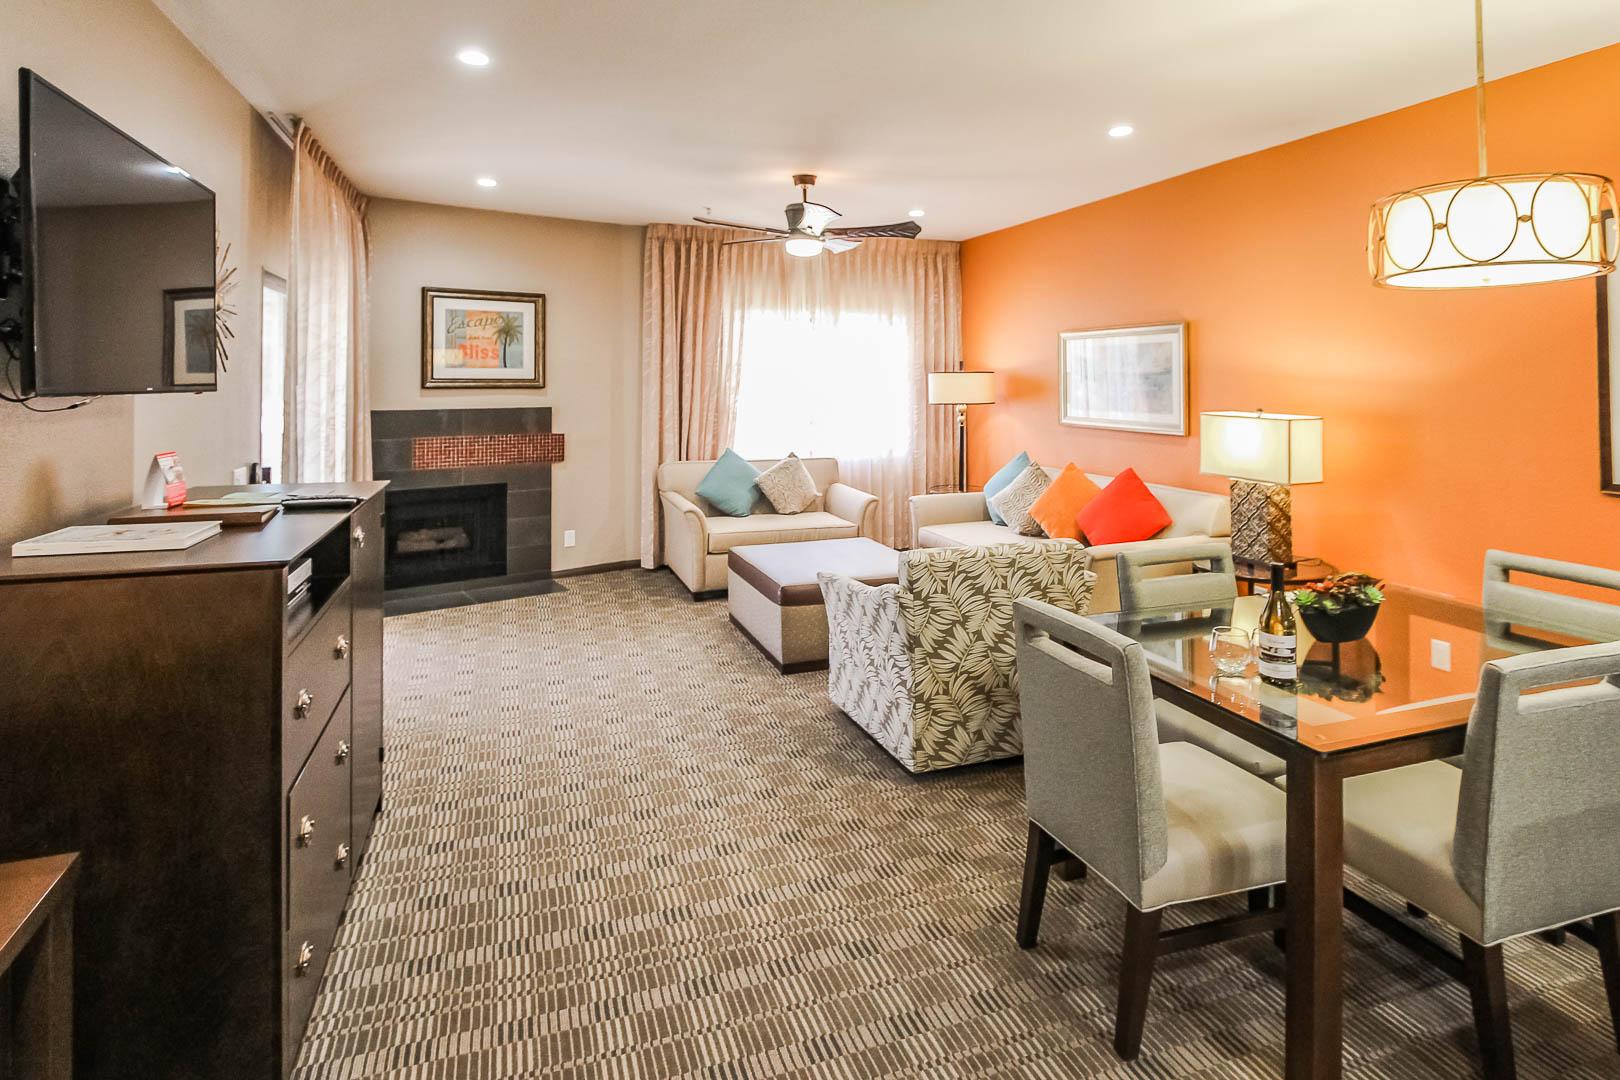 A modernized living and dining room area at VRI's Desert Isle Resort in California.